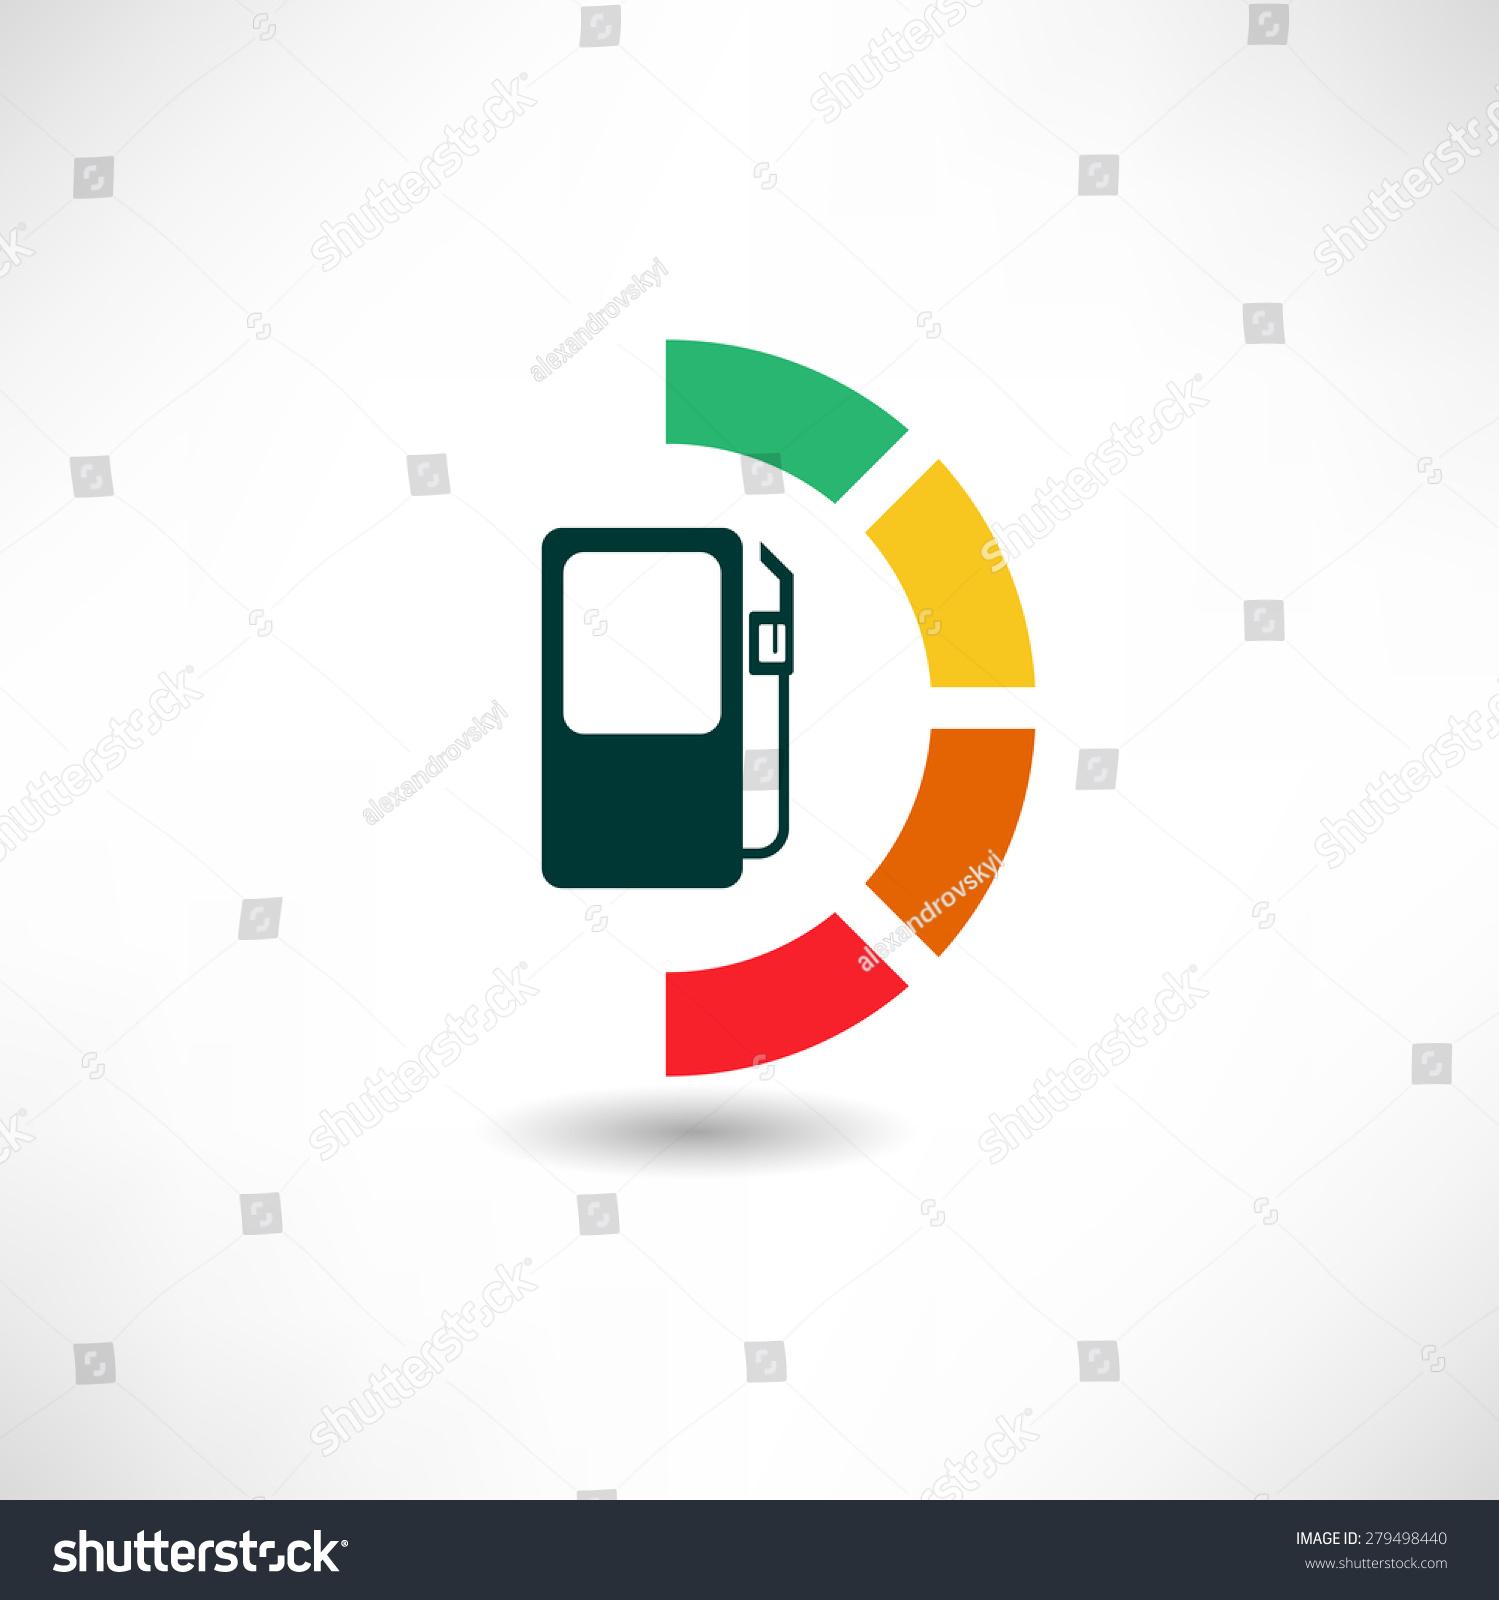 Fuel Level Sensor Icon Stock Vector 279498440 - Shutterstock